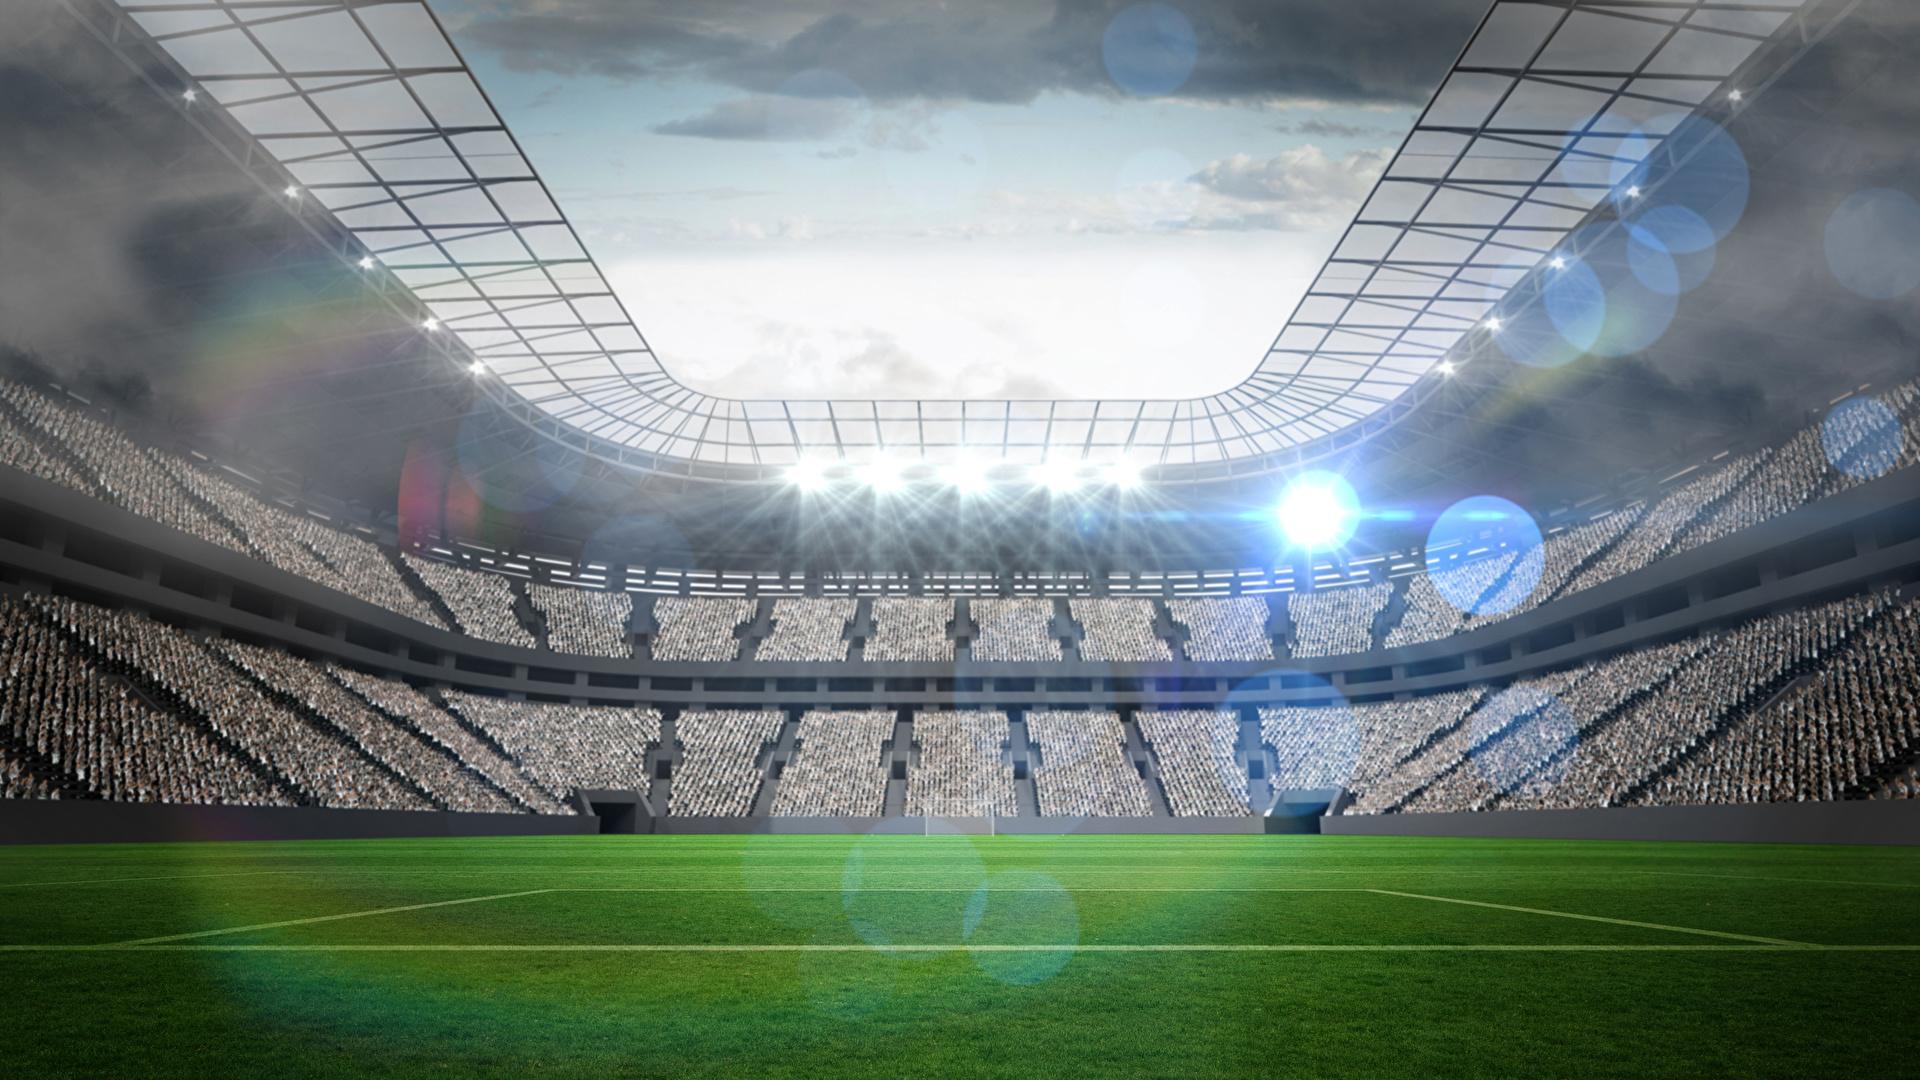 Foto Sport Fussball Stadion Rasen 1920x1080